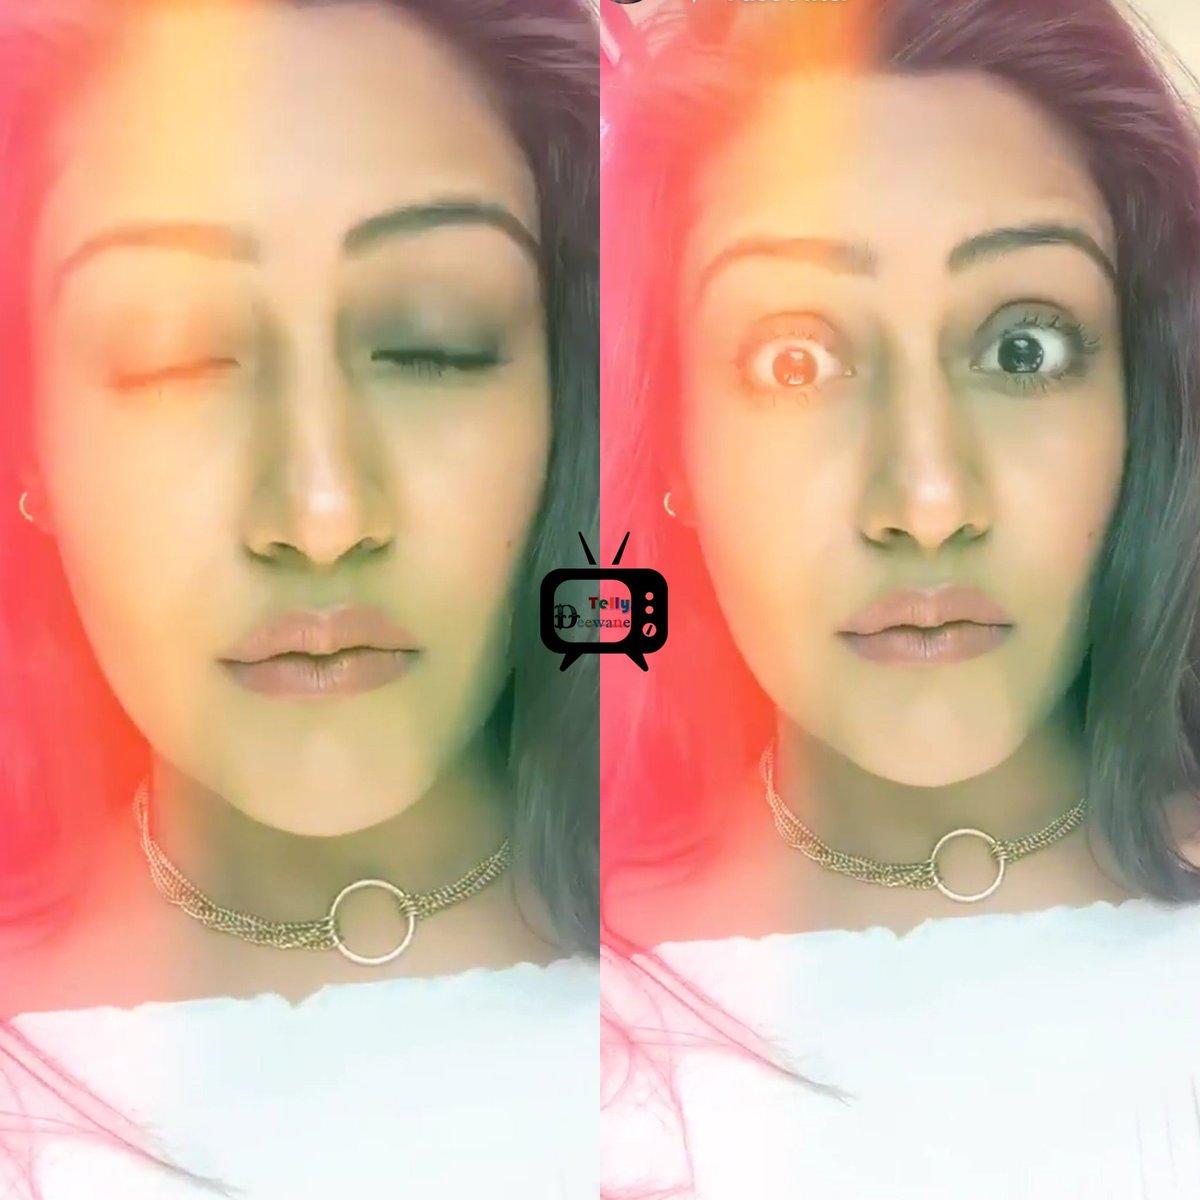 One Word For Expression Queen @SurbhiChandna    #SurbhiChandna #Annika  #khidkitodanika #scians #Shivika #TellyDeewane #ShivikaKaIshqbaaaz  @TellyDeewane<br>http://pic.twitter.com/yTzQjJOoEp